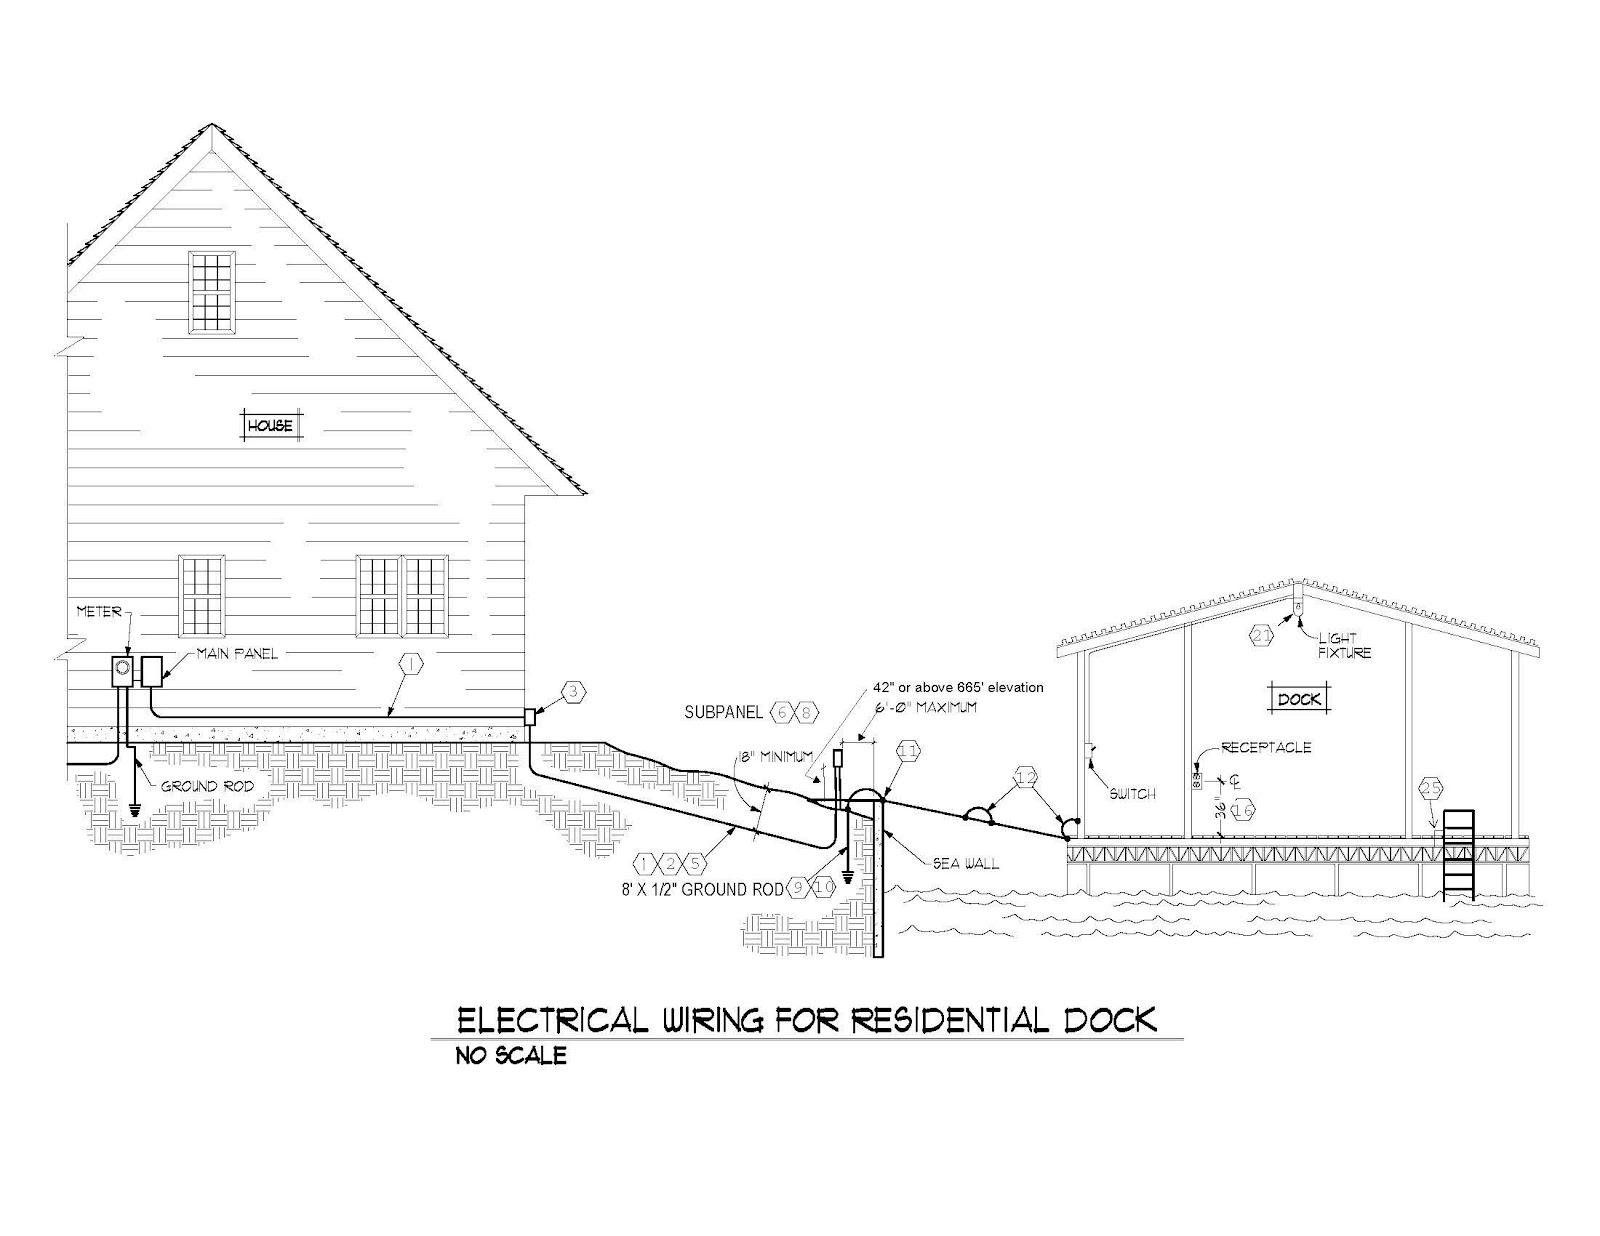 dock wiring diagram